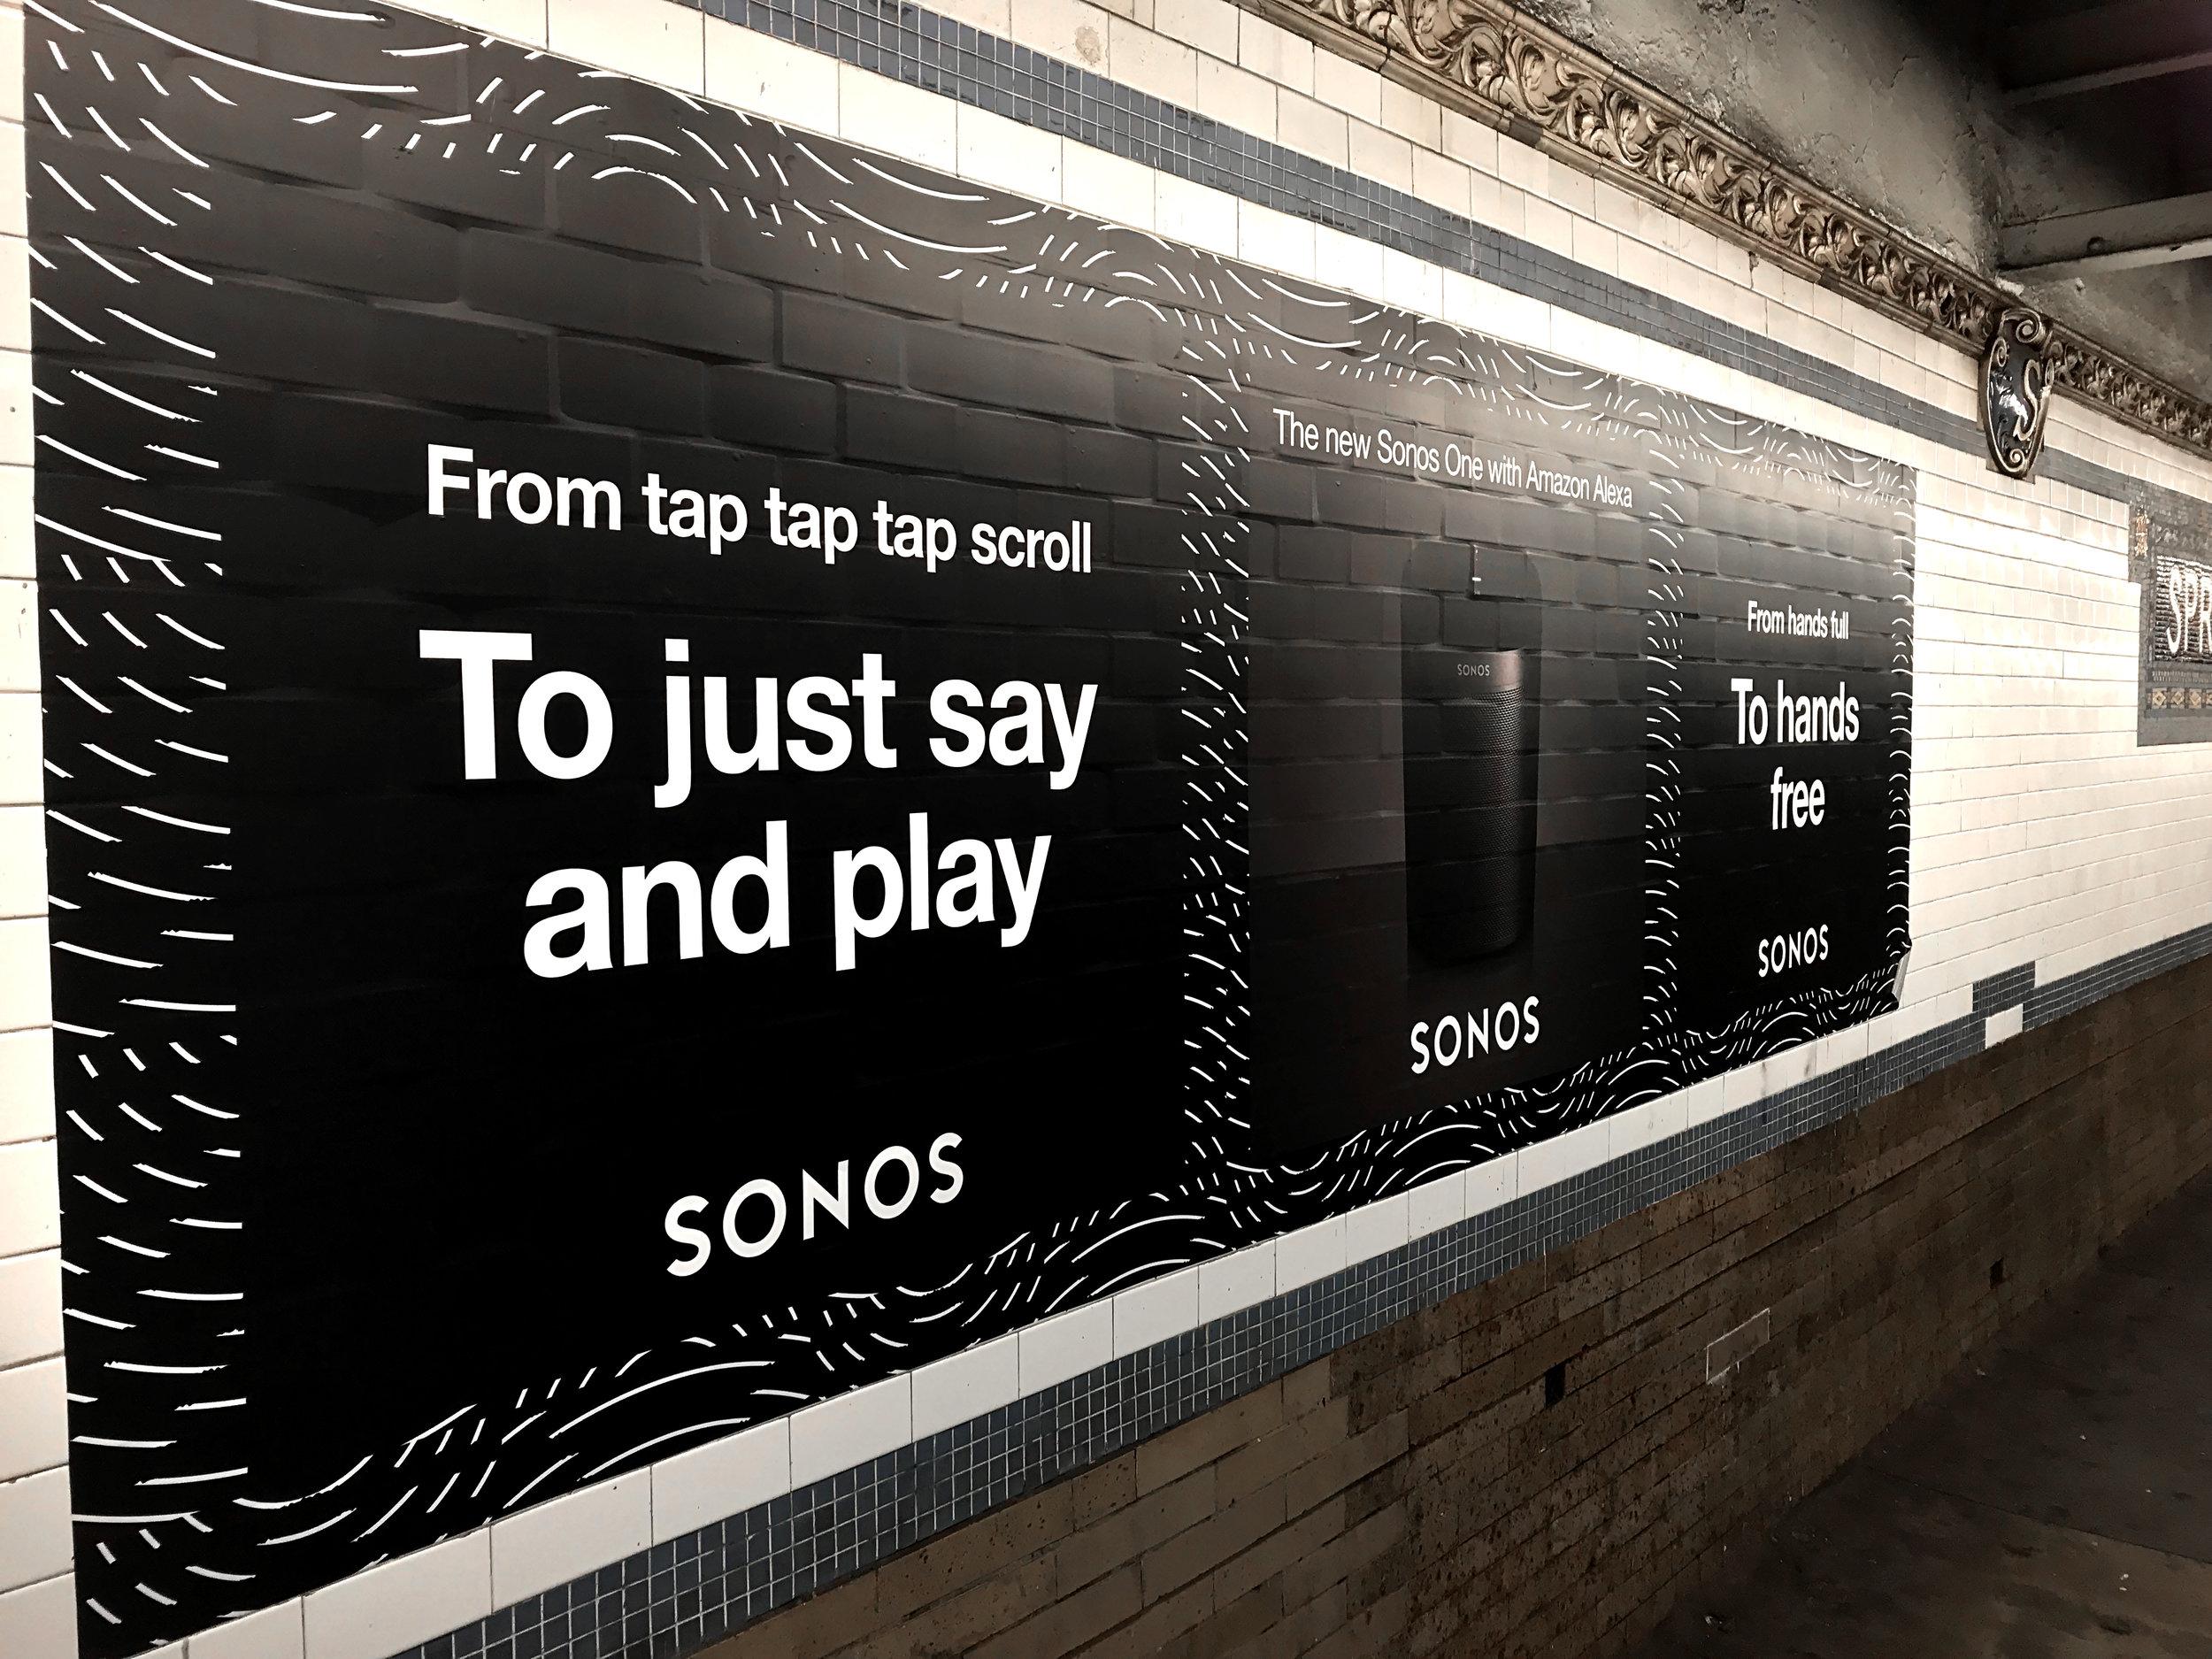 Sonos_station12.jpg